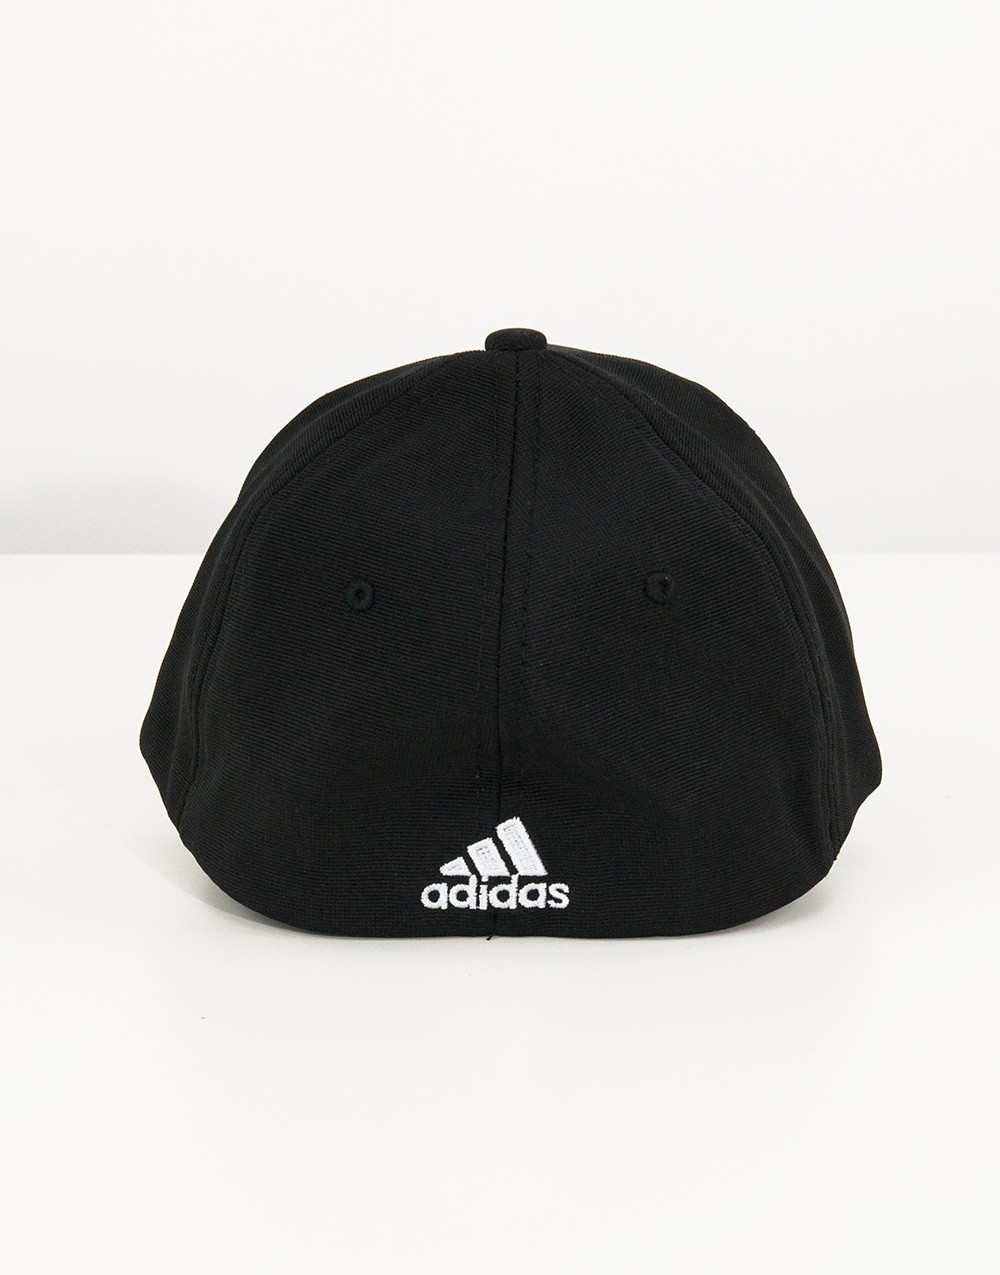 ŞAPKA - Full Cap - Adidas Flexi Full Cap Hip Hop Şapka HC5159SY e278f452858